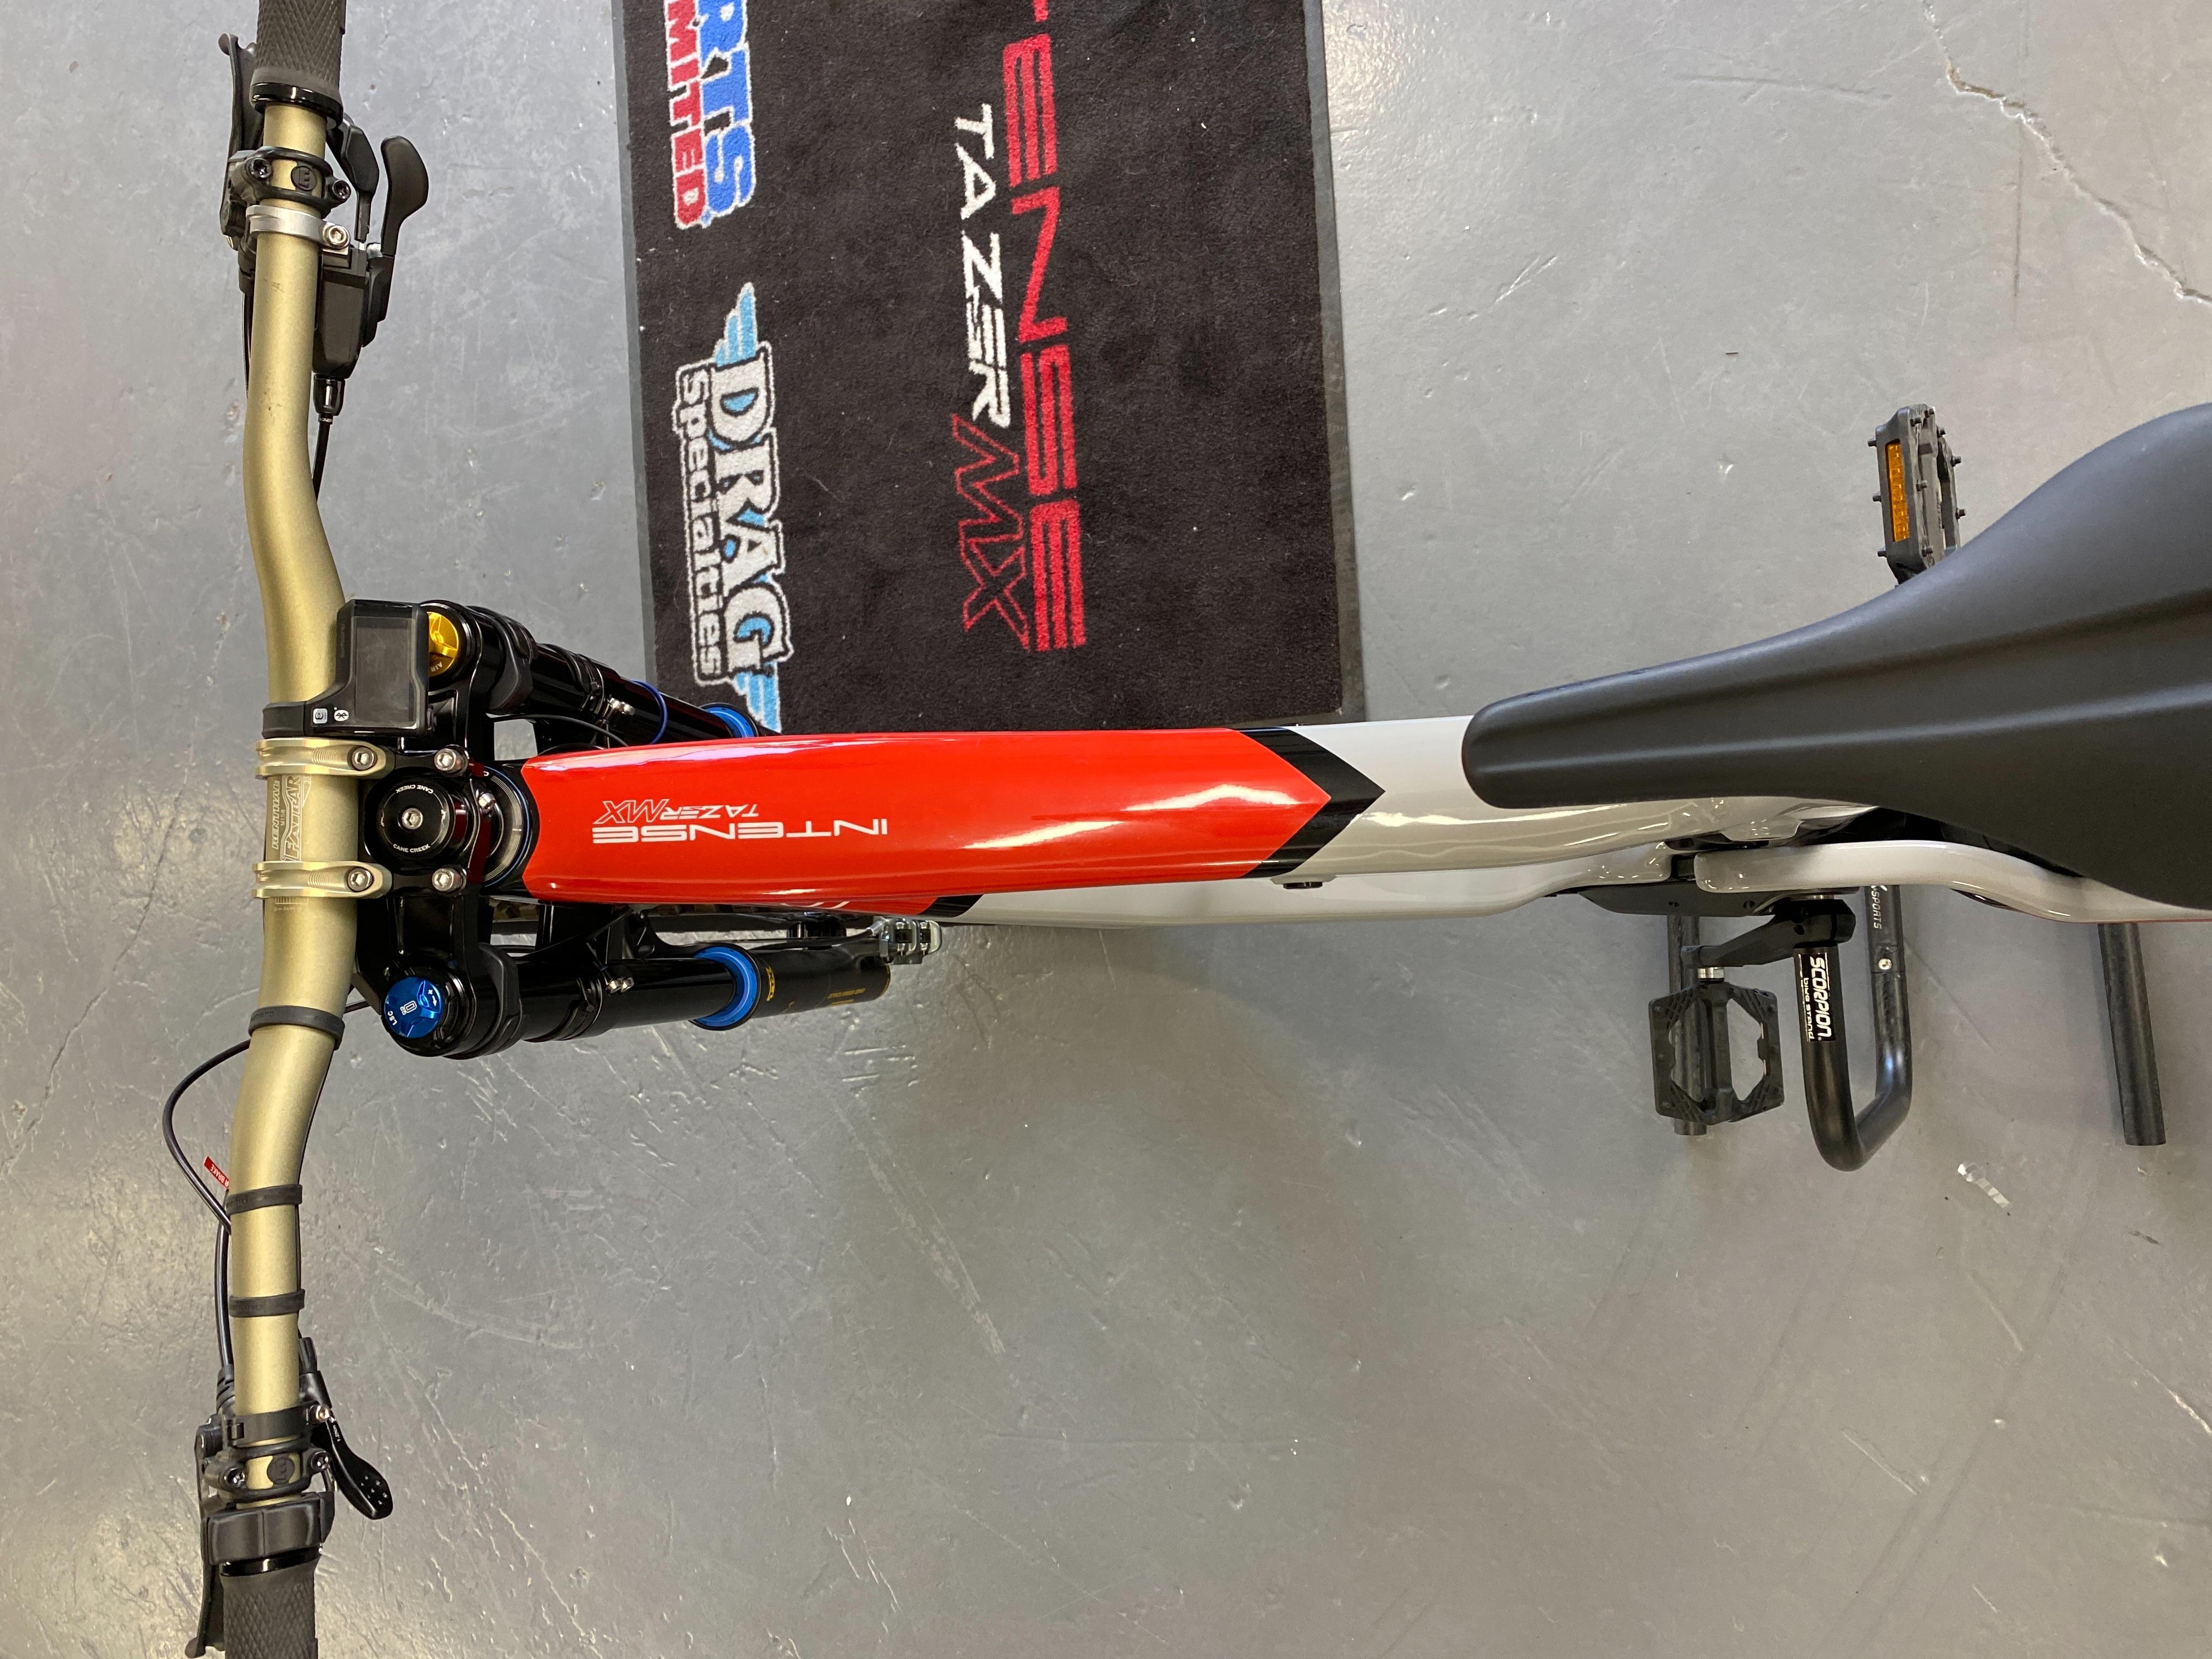 2021 Intense Tazer MX Pro at Cascade Motorsports